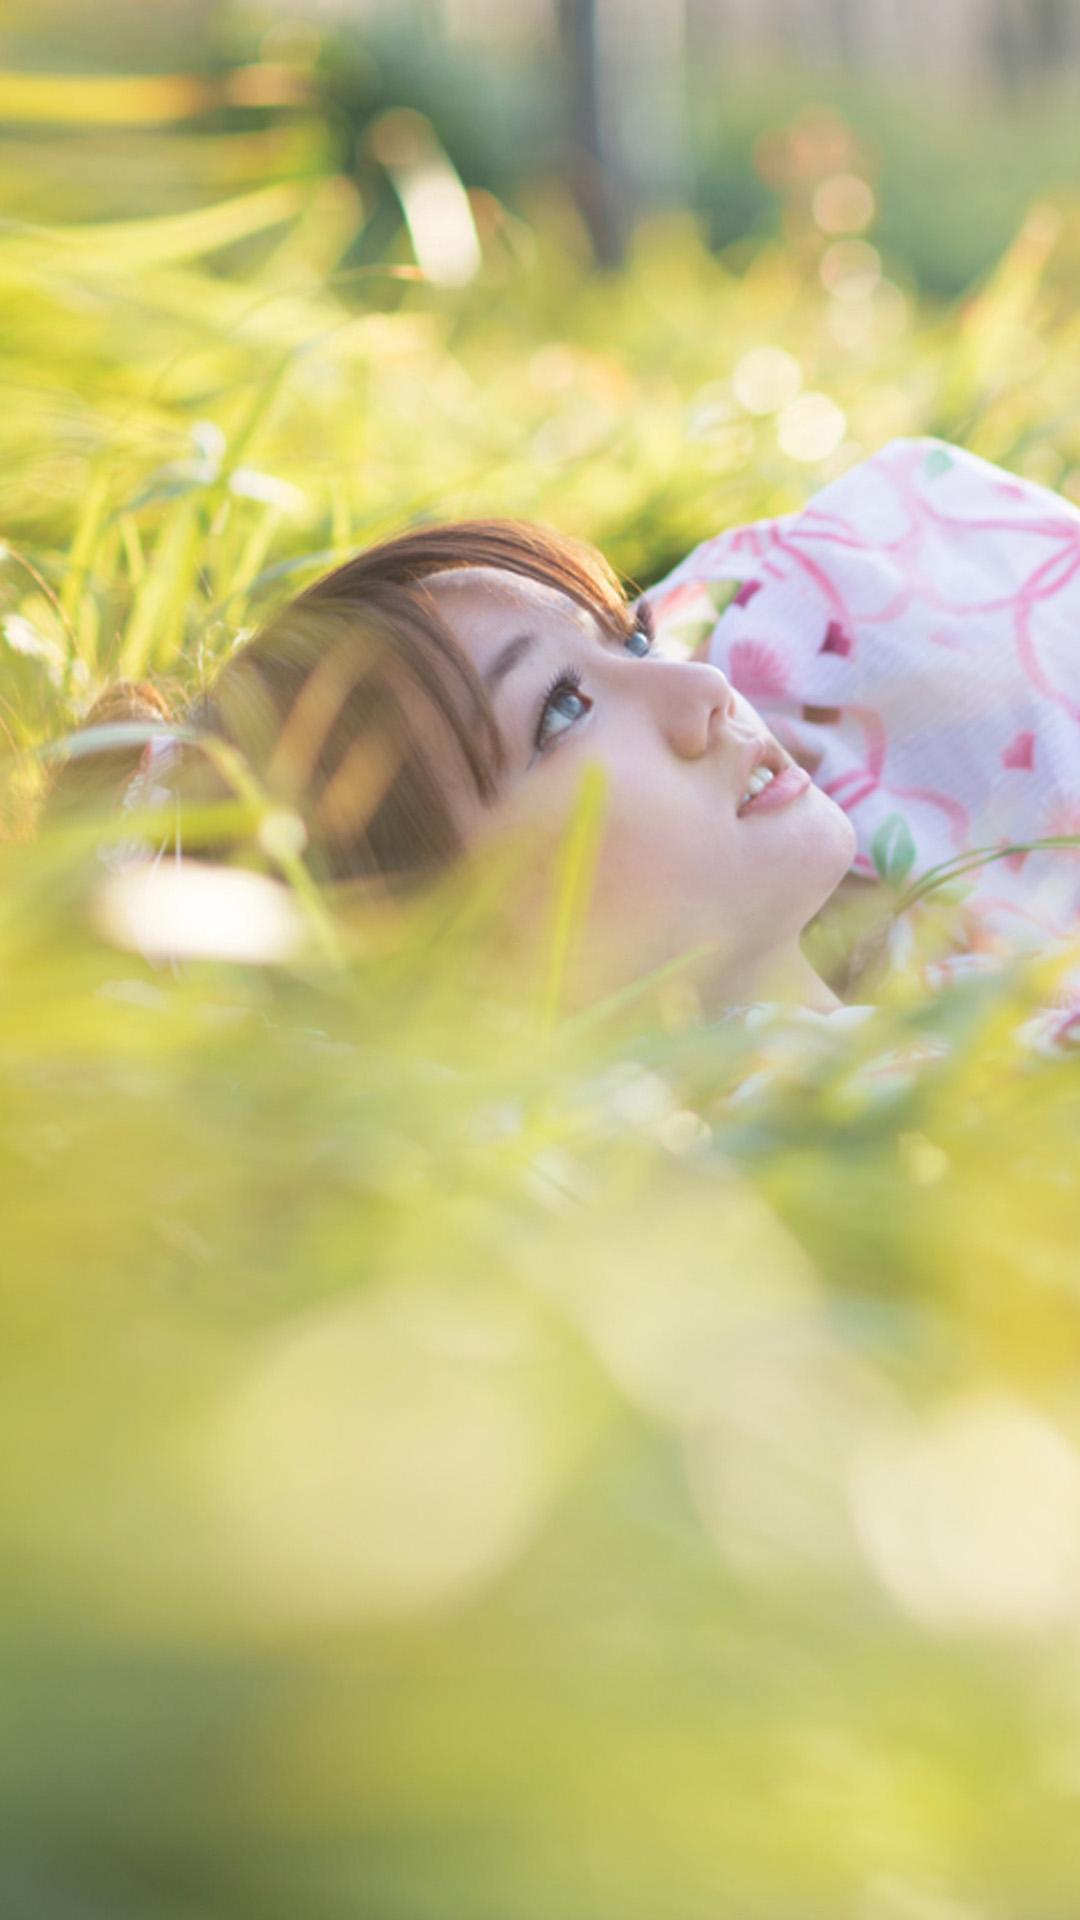 Girl's innocence Japan